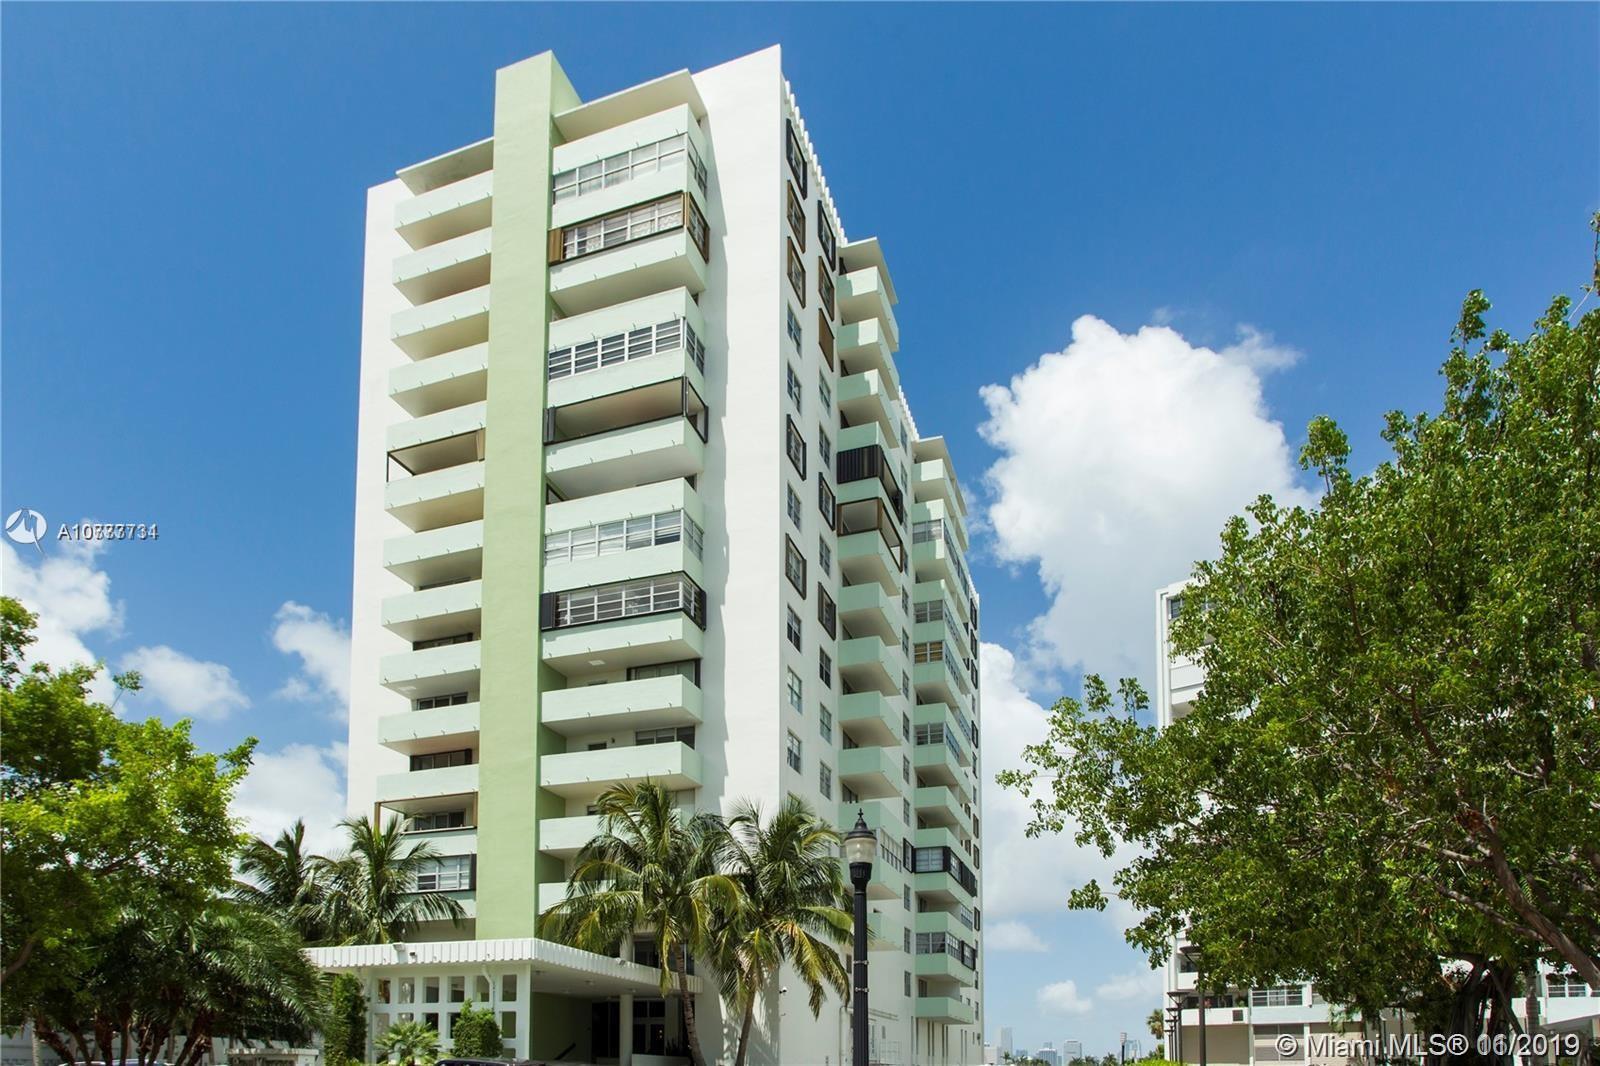 5 Island Ave, 3J - Miami Beach, Florida